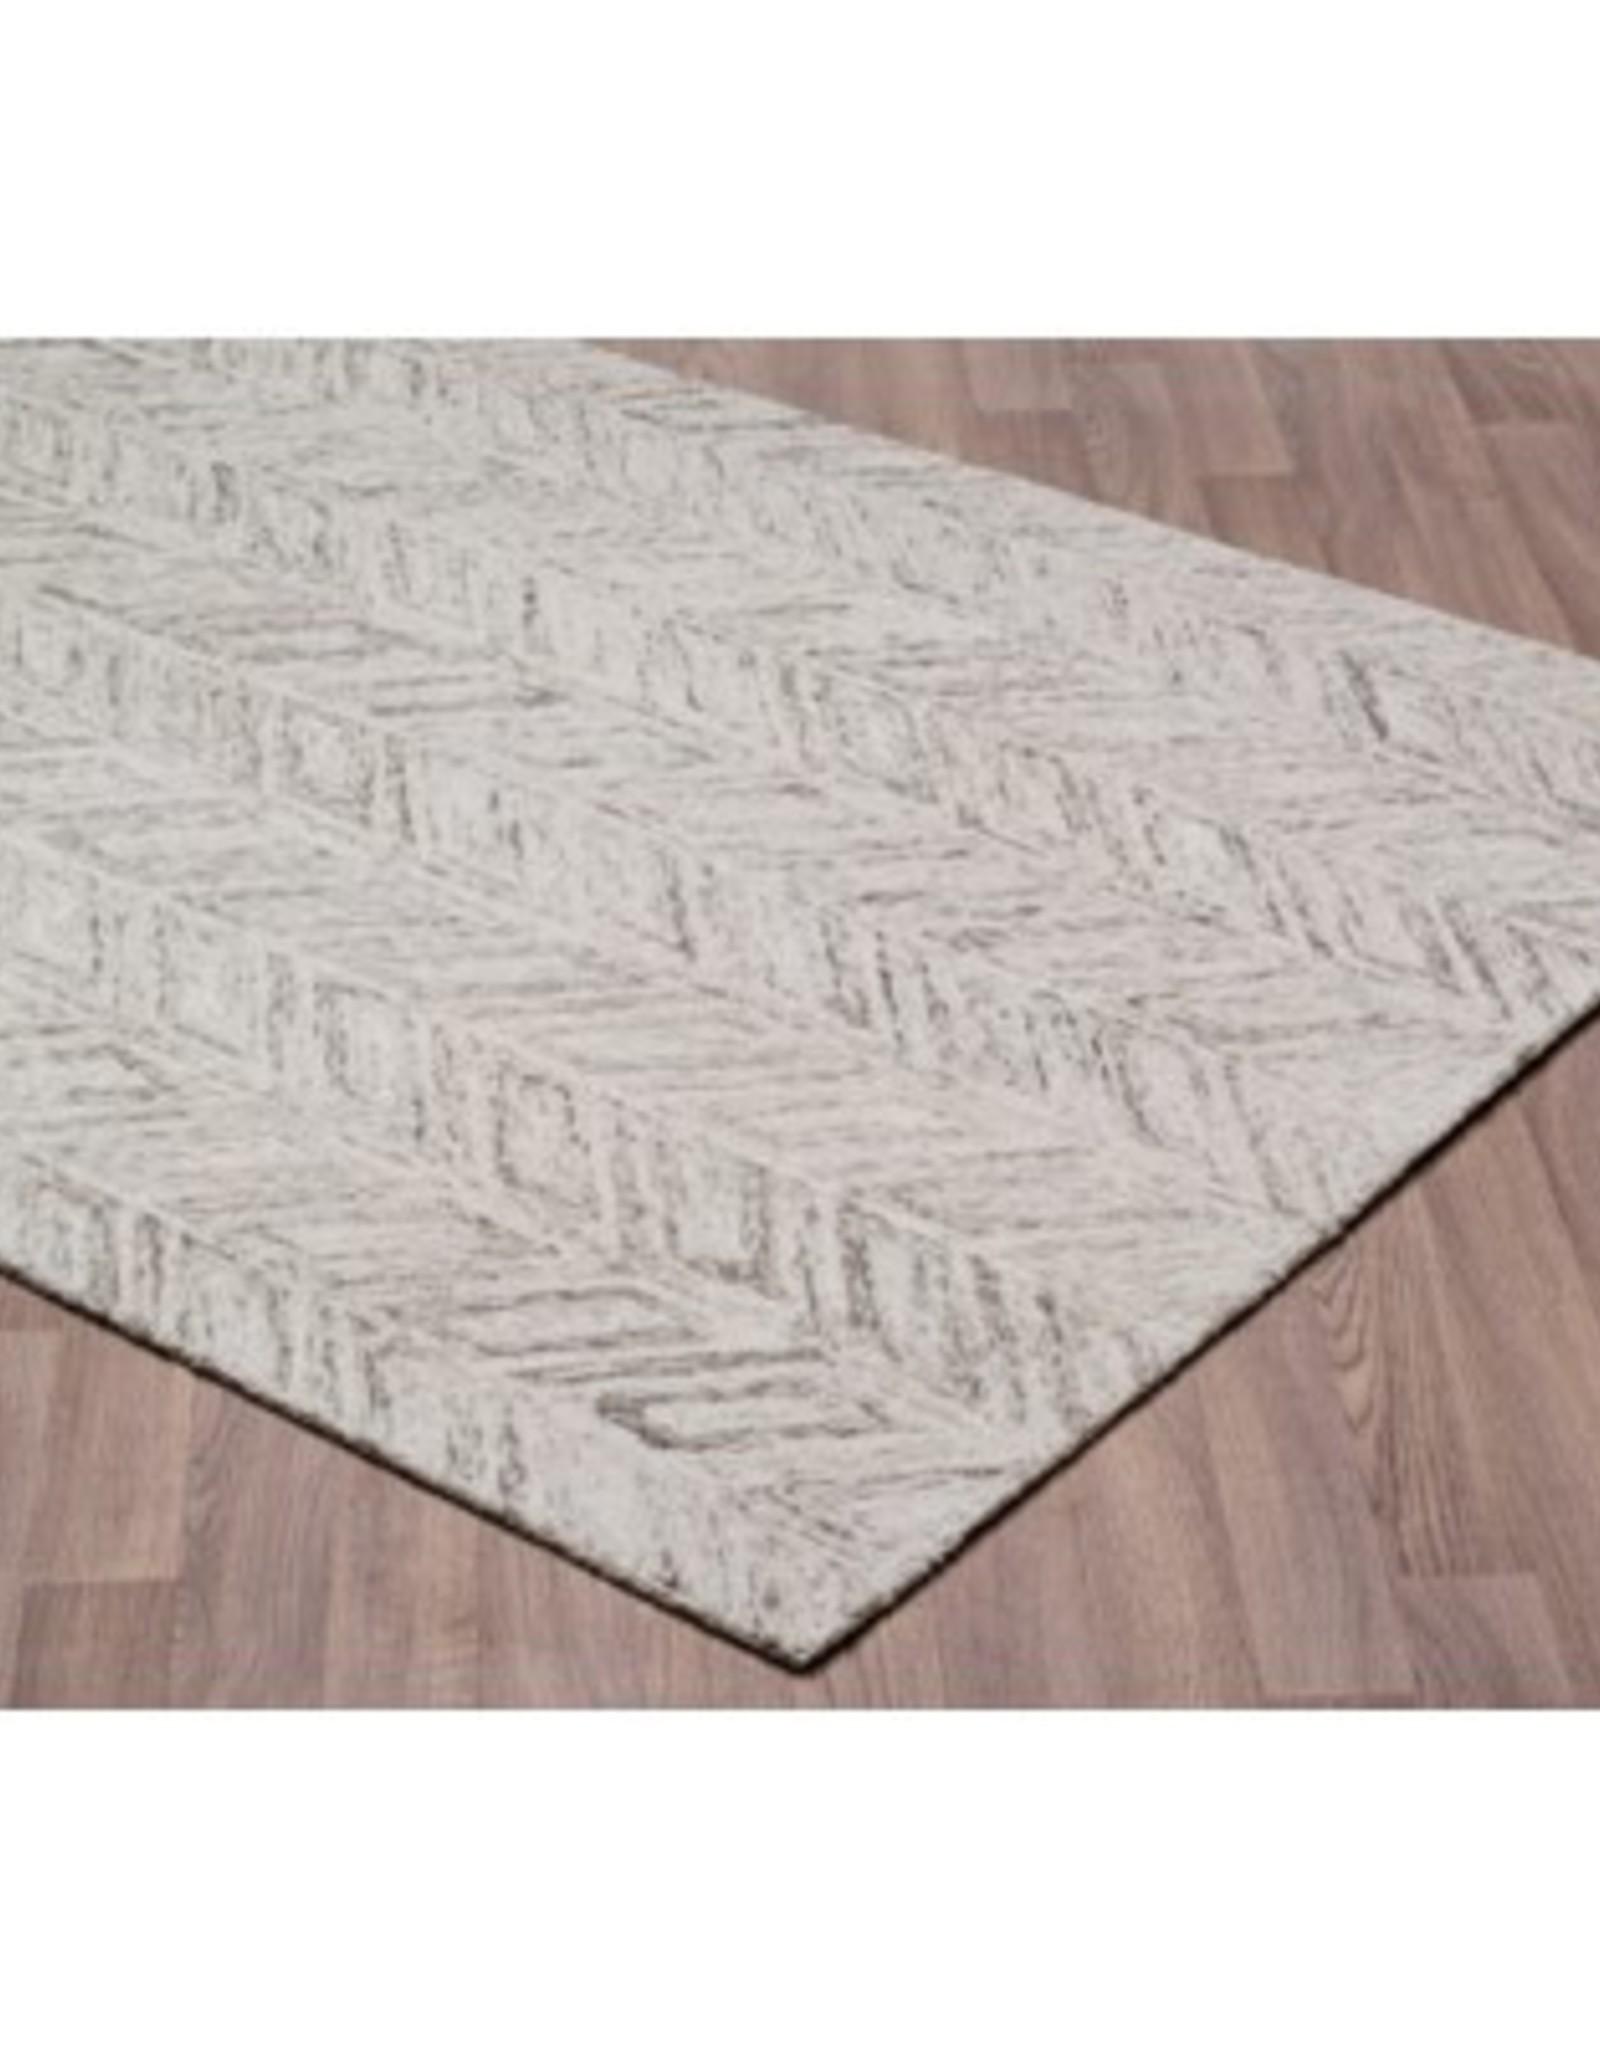 Rugs Viana Cloud 9 Hand Tufted Wool Grey 2 x 3